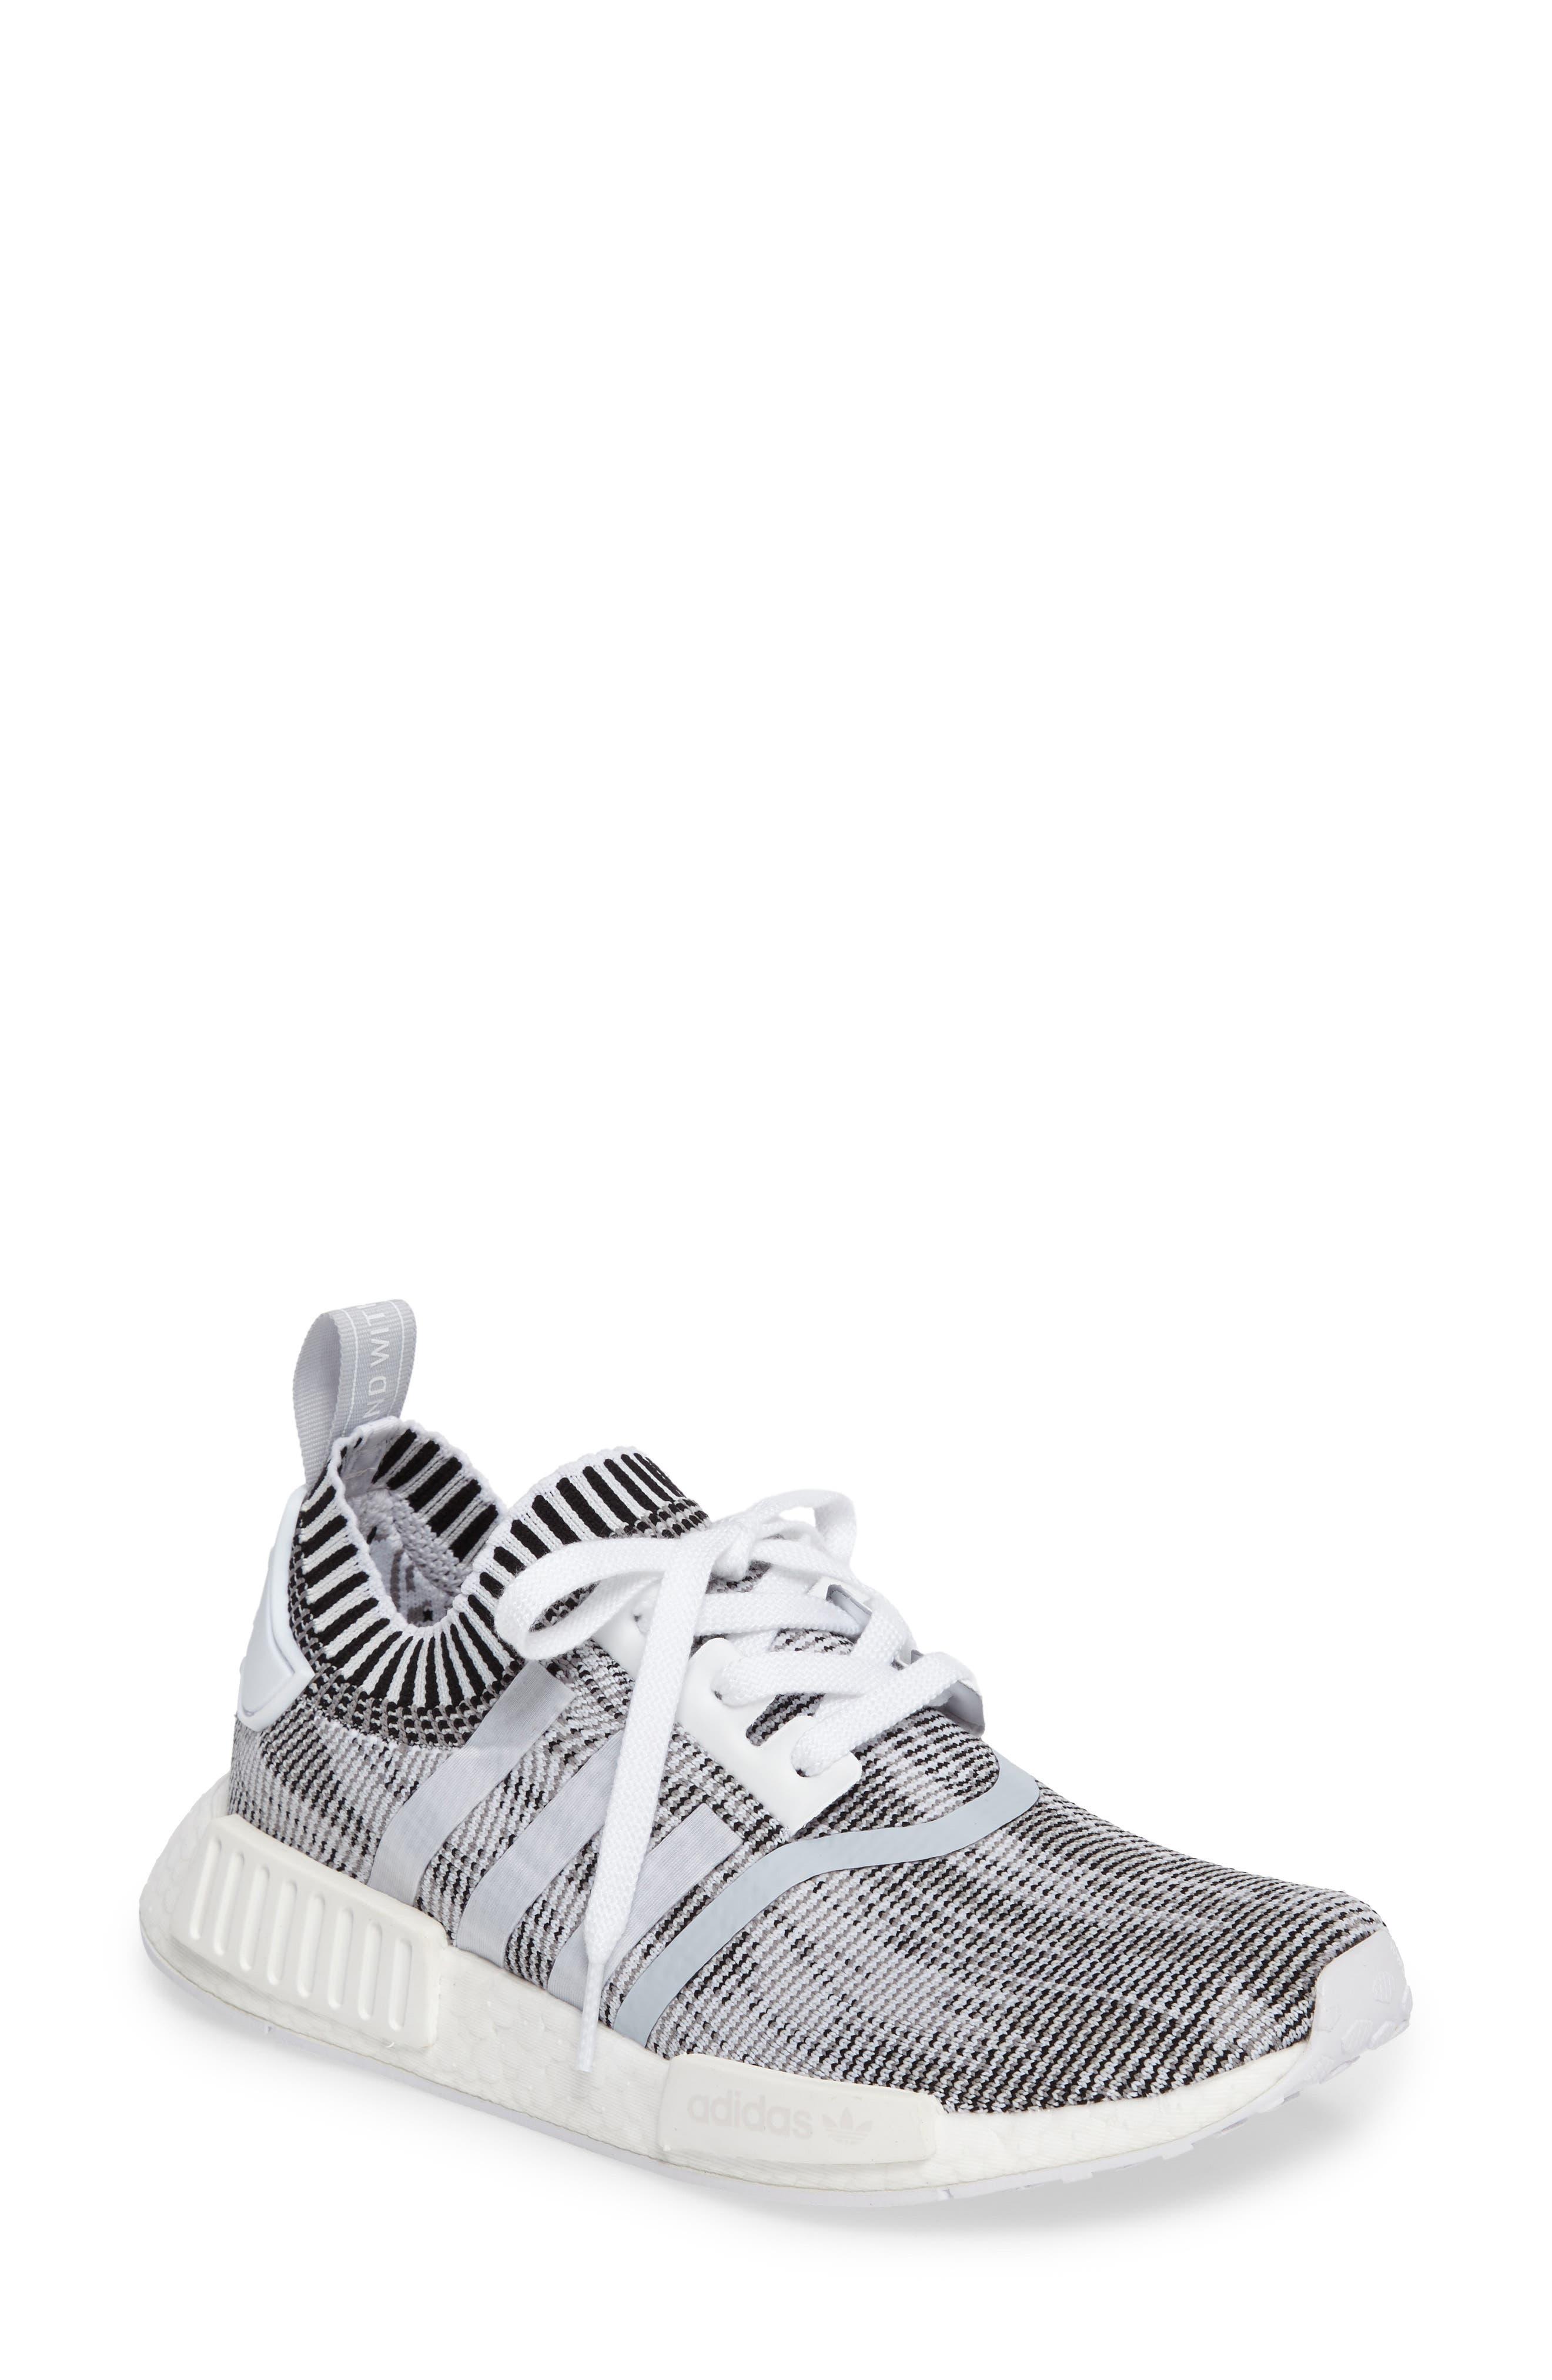 Main Image - adidas \u0027NMD - R1\u0027 Running Shoe (Women)